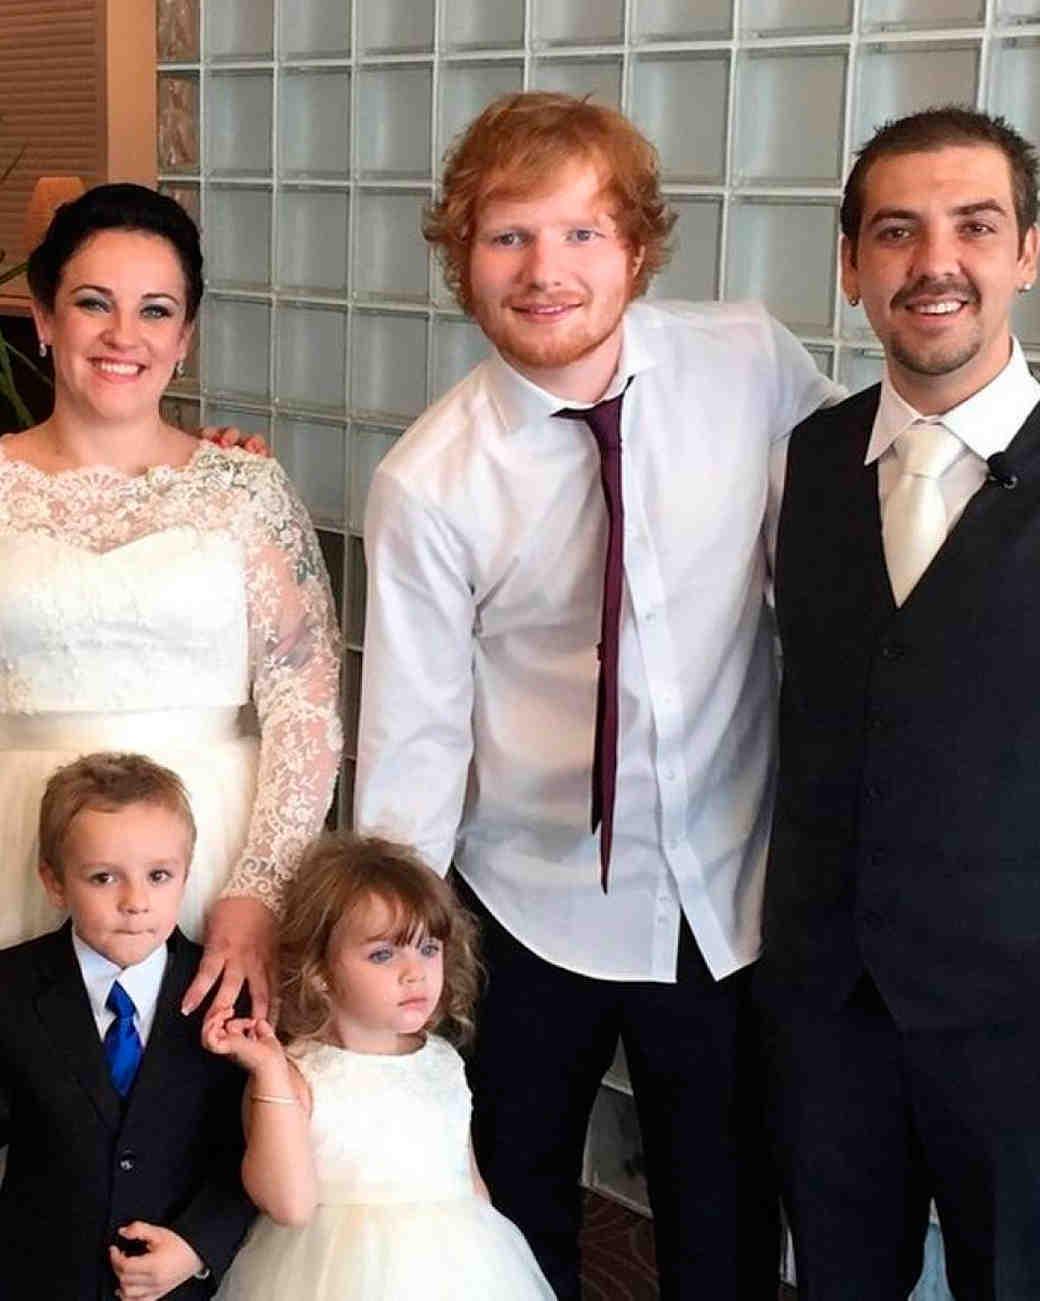 celebrity-wedding-crashers-ed-sheeran-1215.jpg